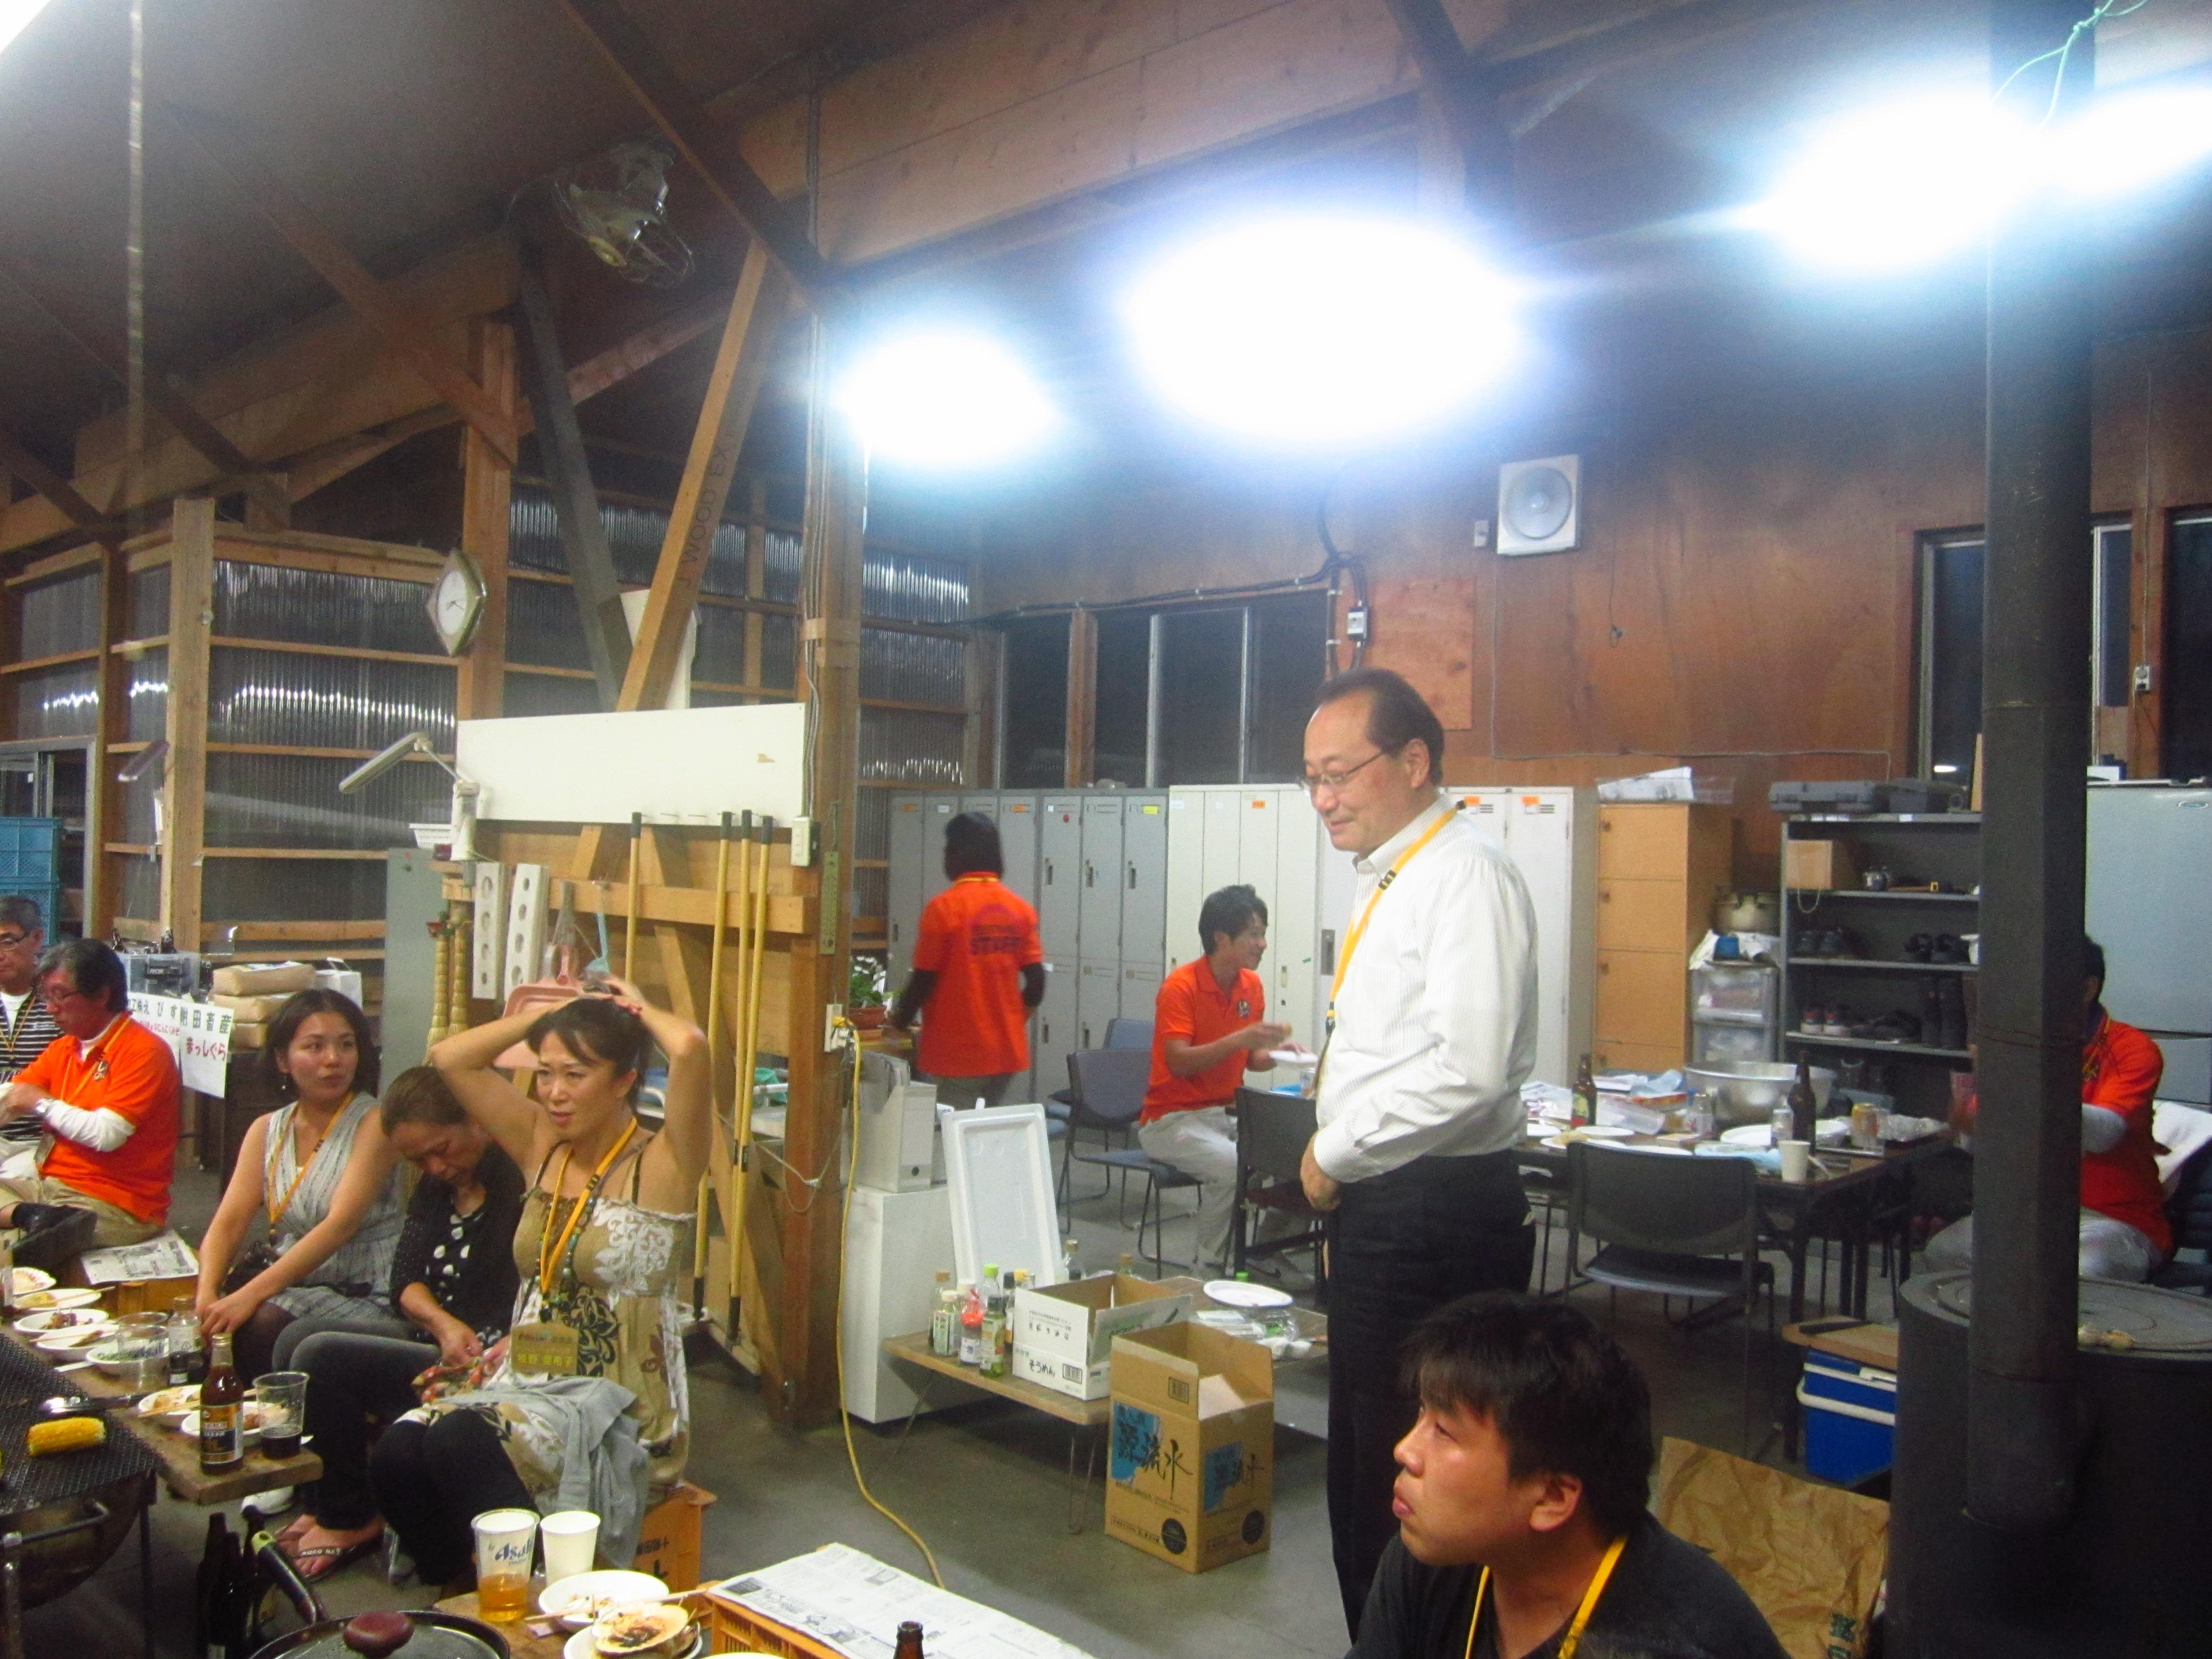 IMG 4329 - 麻布十番納涼祭り25,26日(七戸町出店)